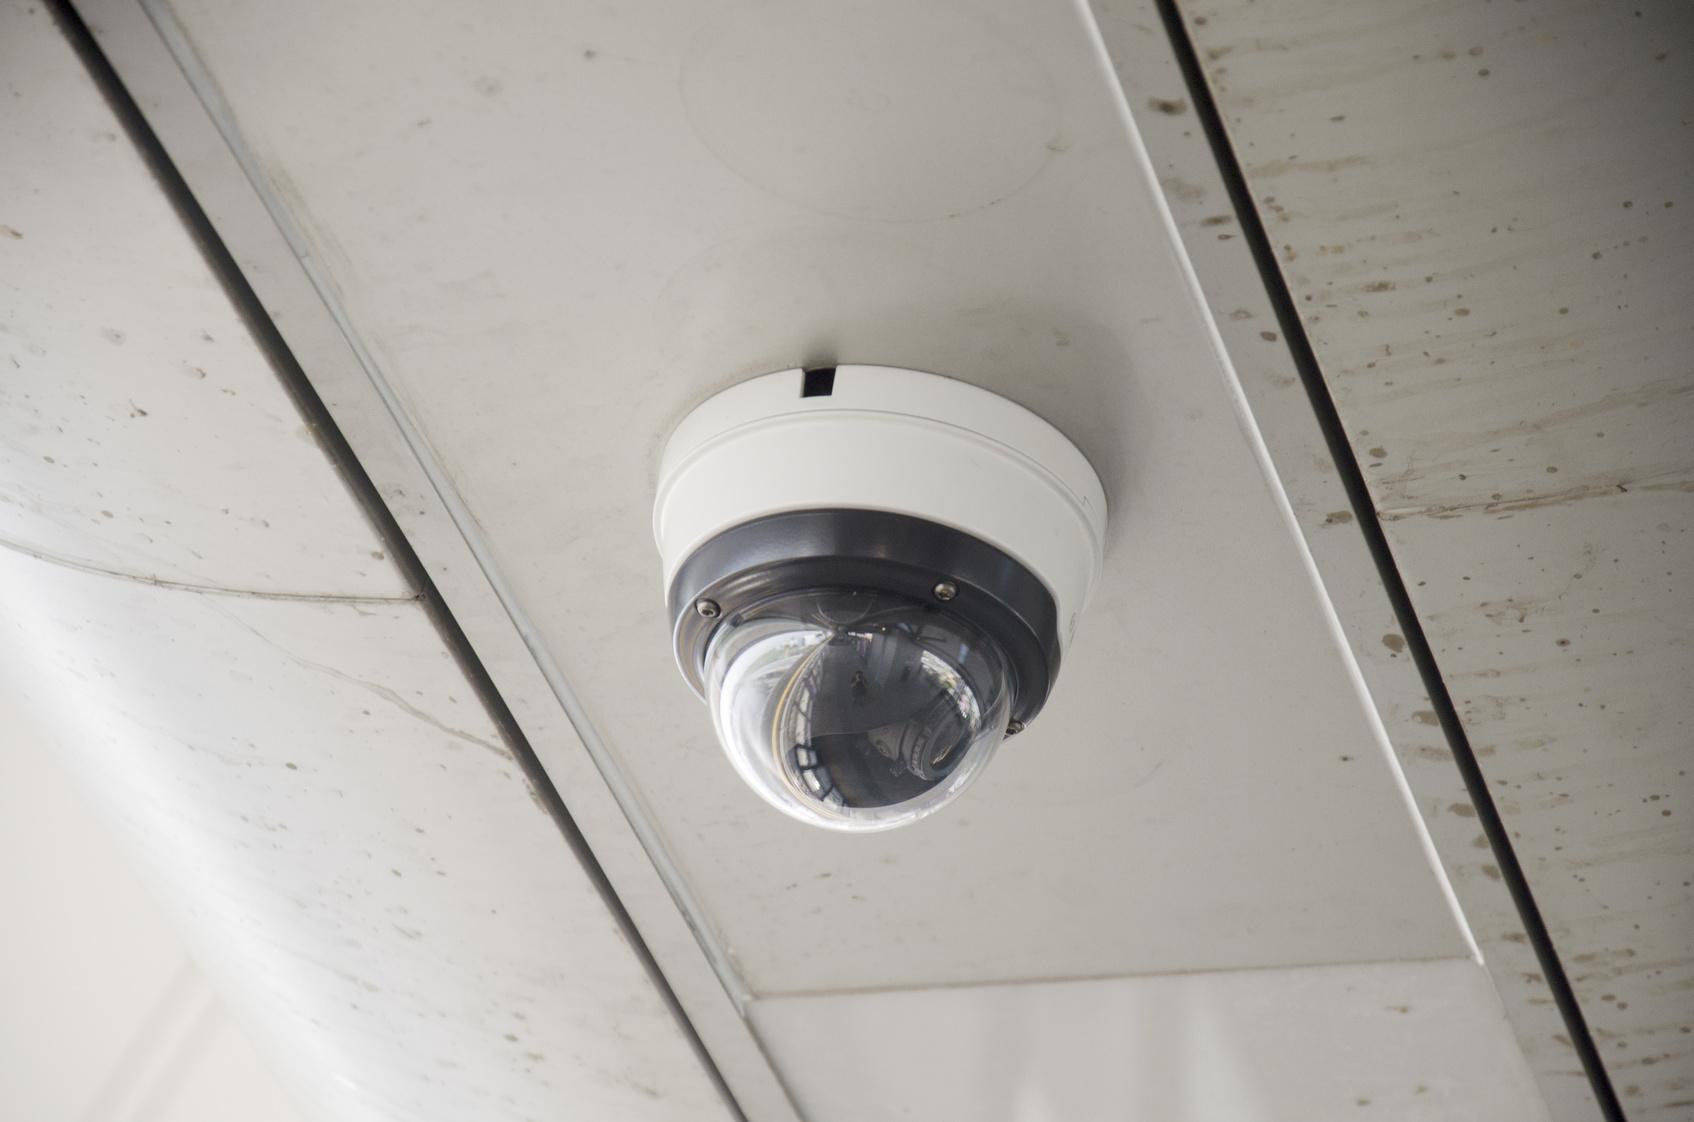 kamera monitoring - Fotolia